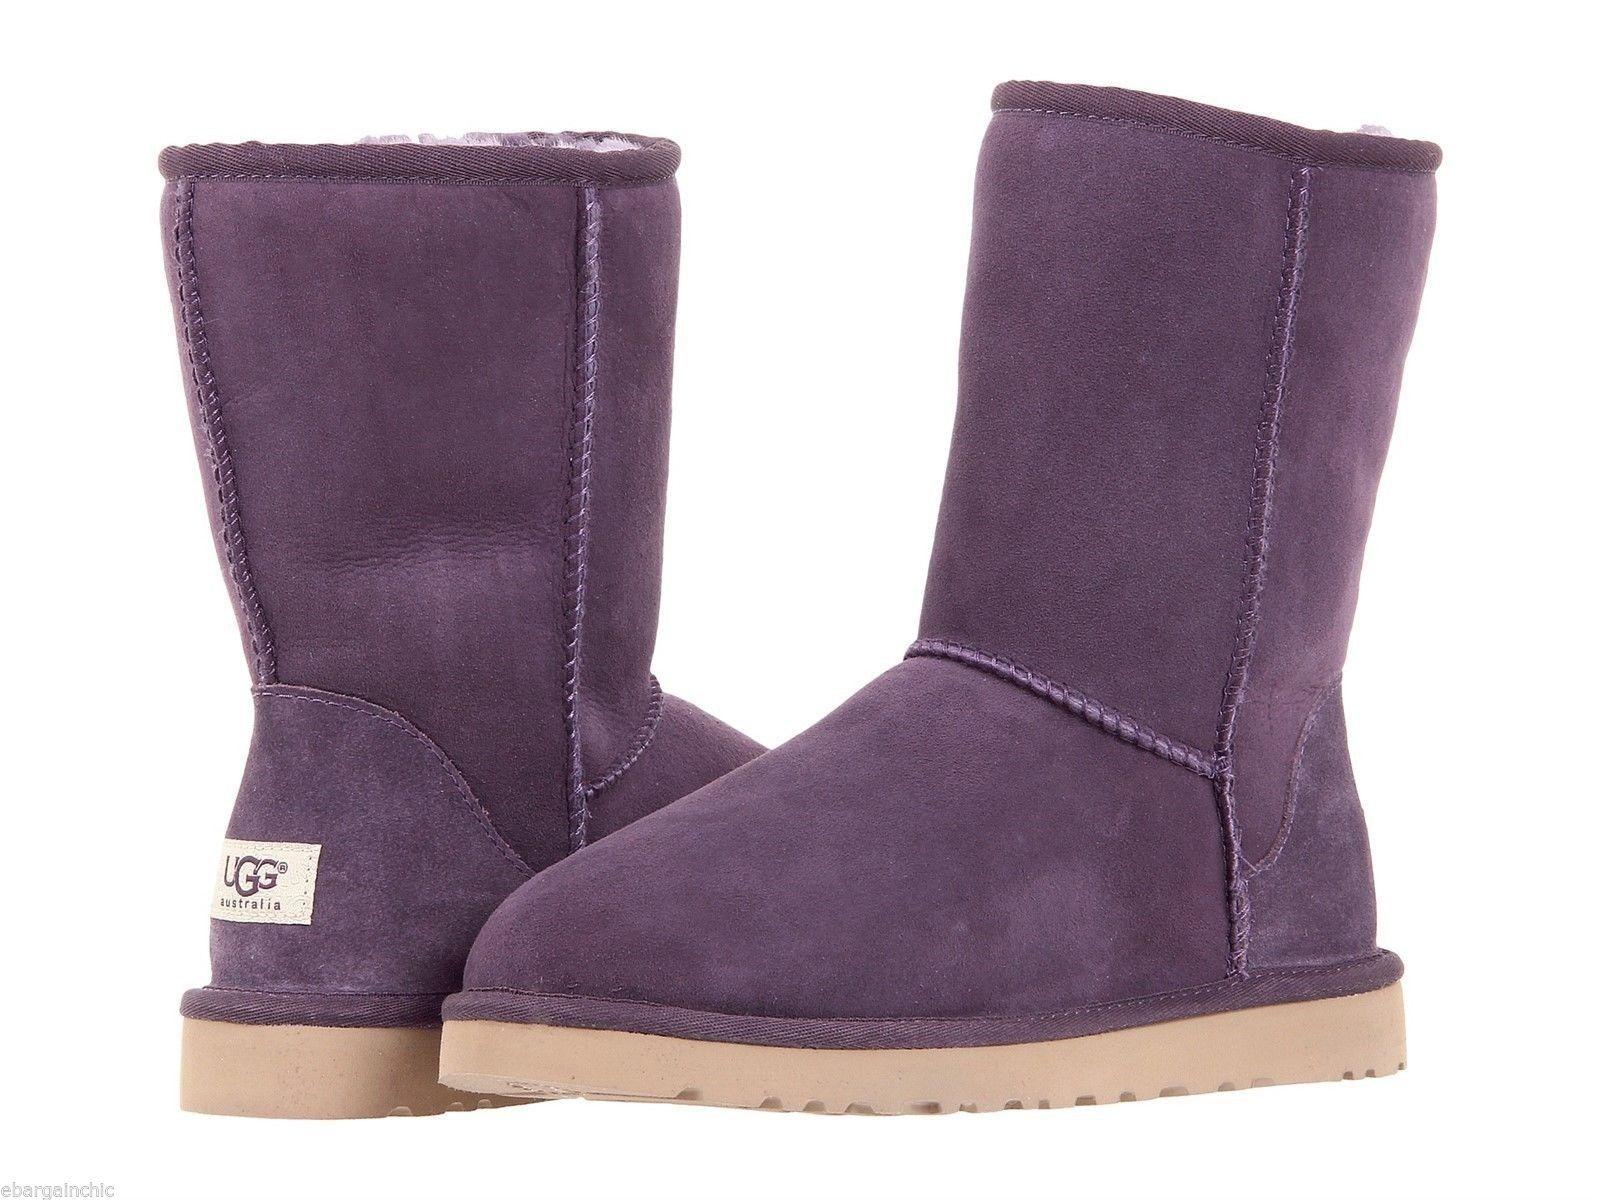 1769ddccb70 Ugg Australia Women's Classic Short Sheepskin Boots Item# 5825 Size ...